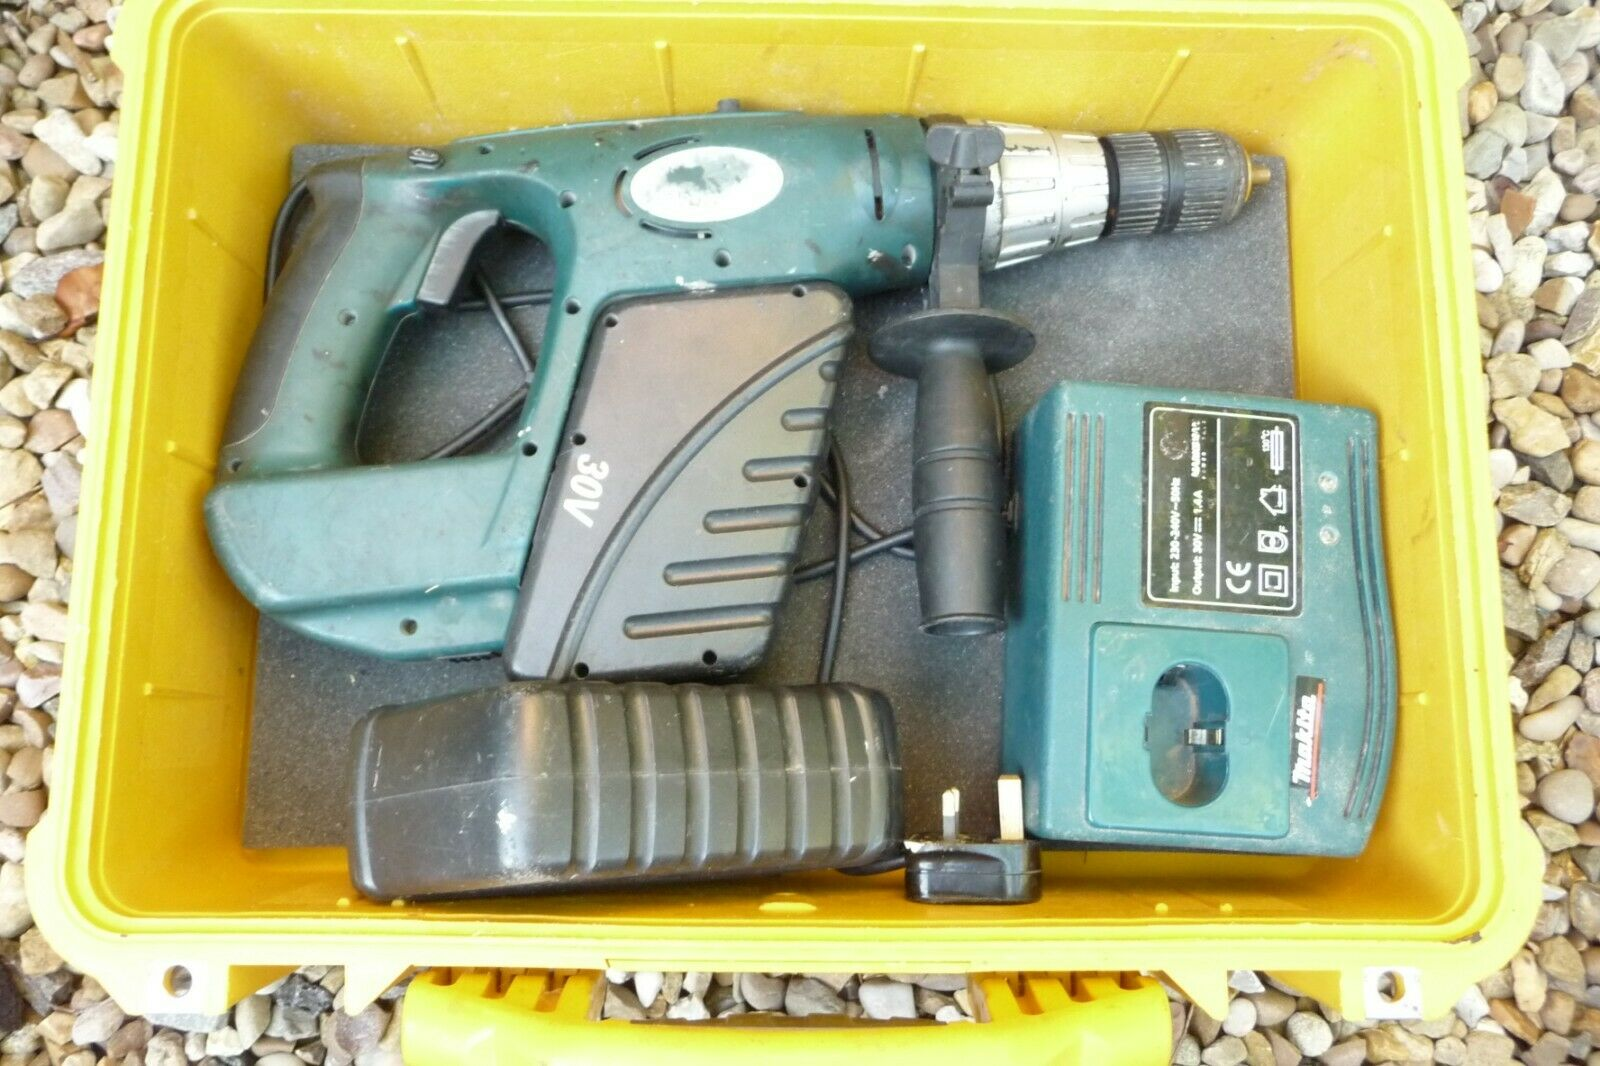 Hammer Drill MARKSMAN 30v &spare battery GOOD life + PELICAN Gelb plastic case